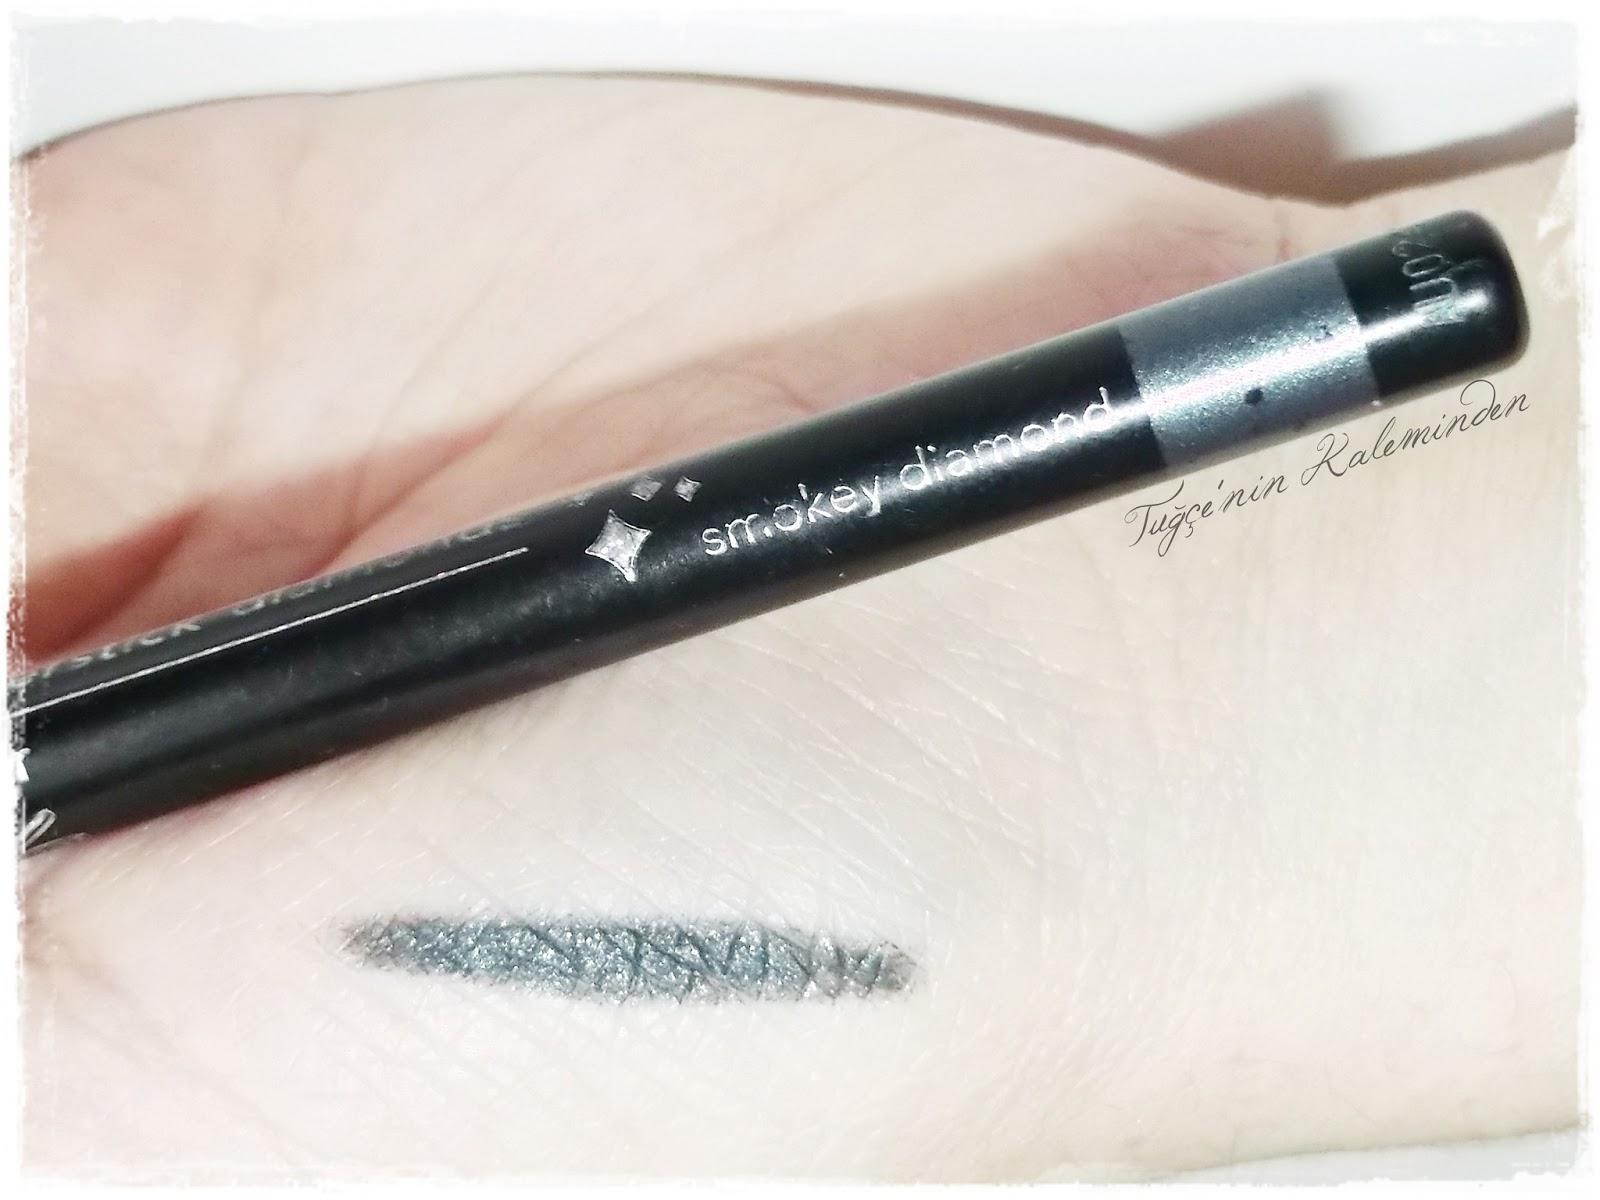 TuĞ 199 E Nİn Kalemİnden ☆ Avon Glimmerstick Diamonds